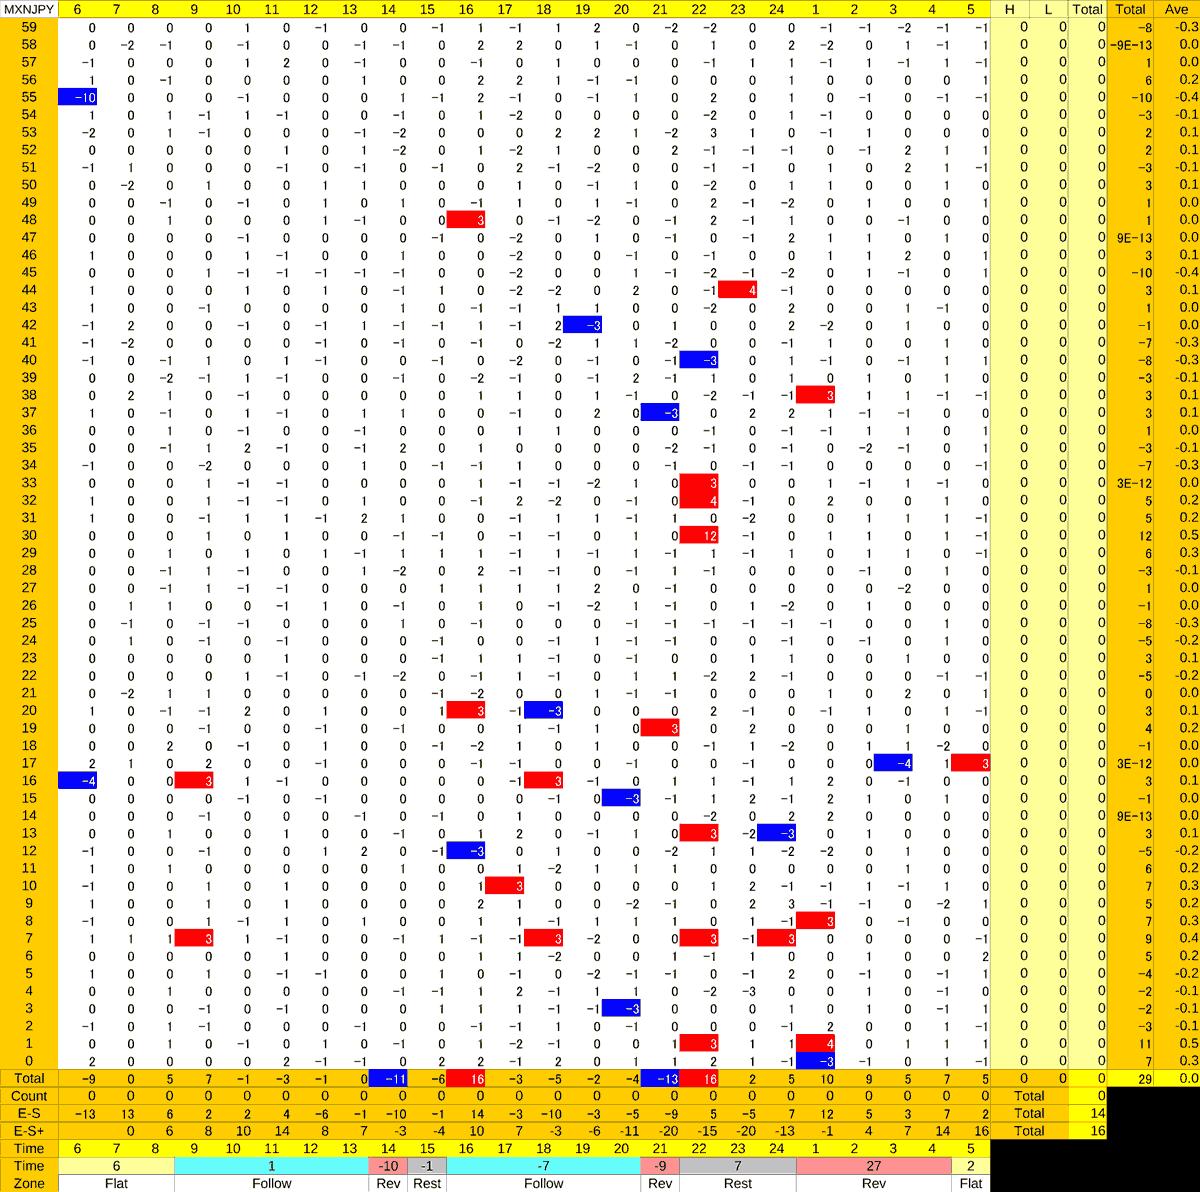 20201125_HS(3)MXNJPY